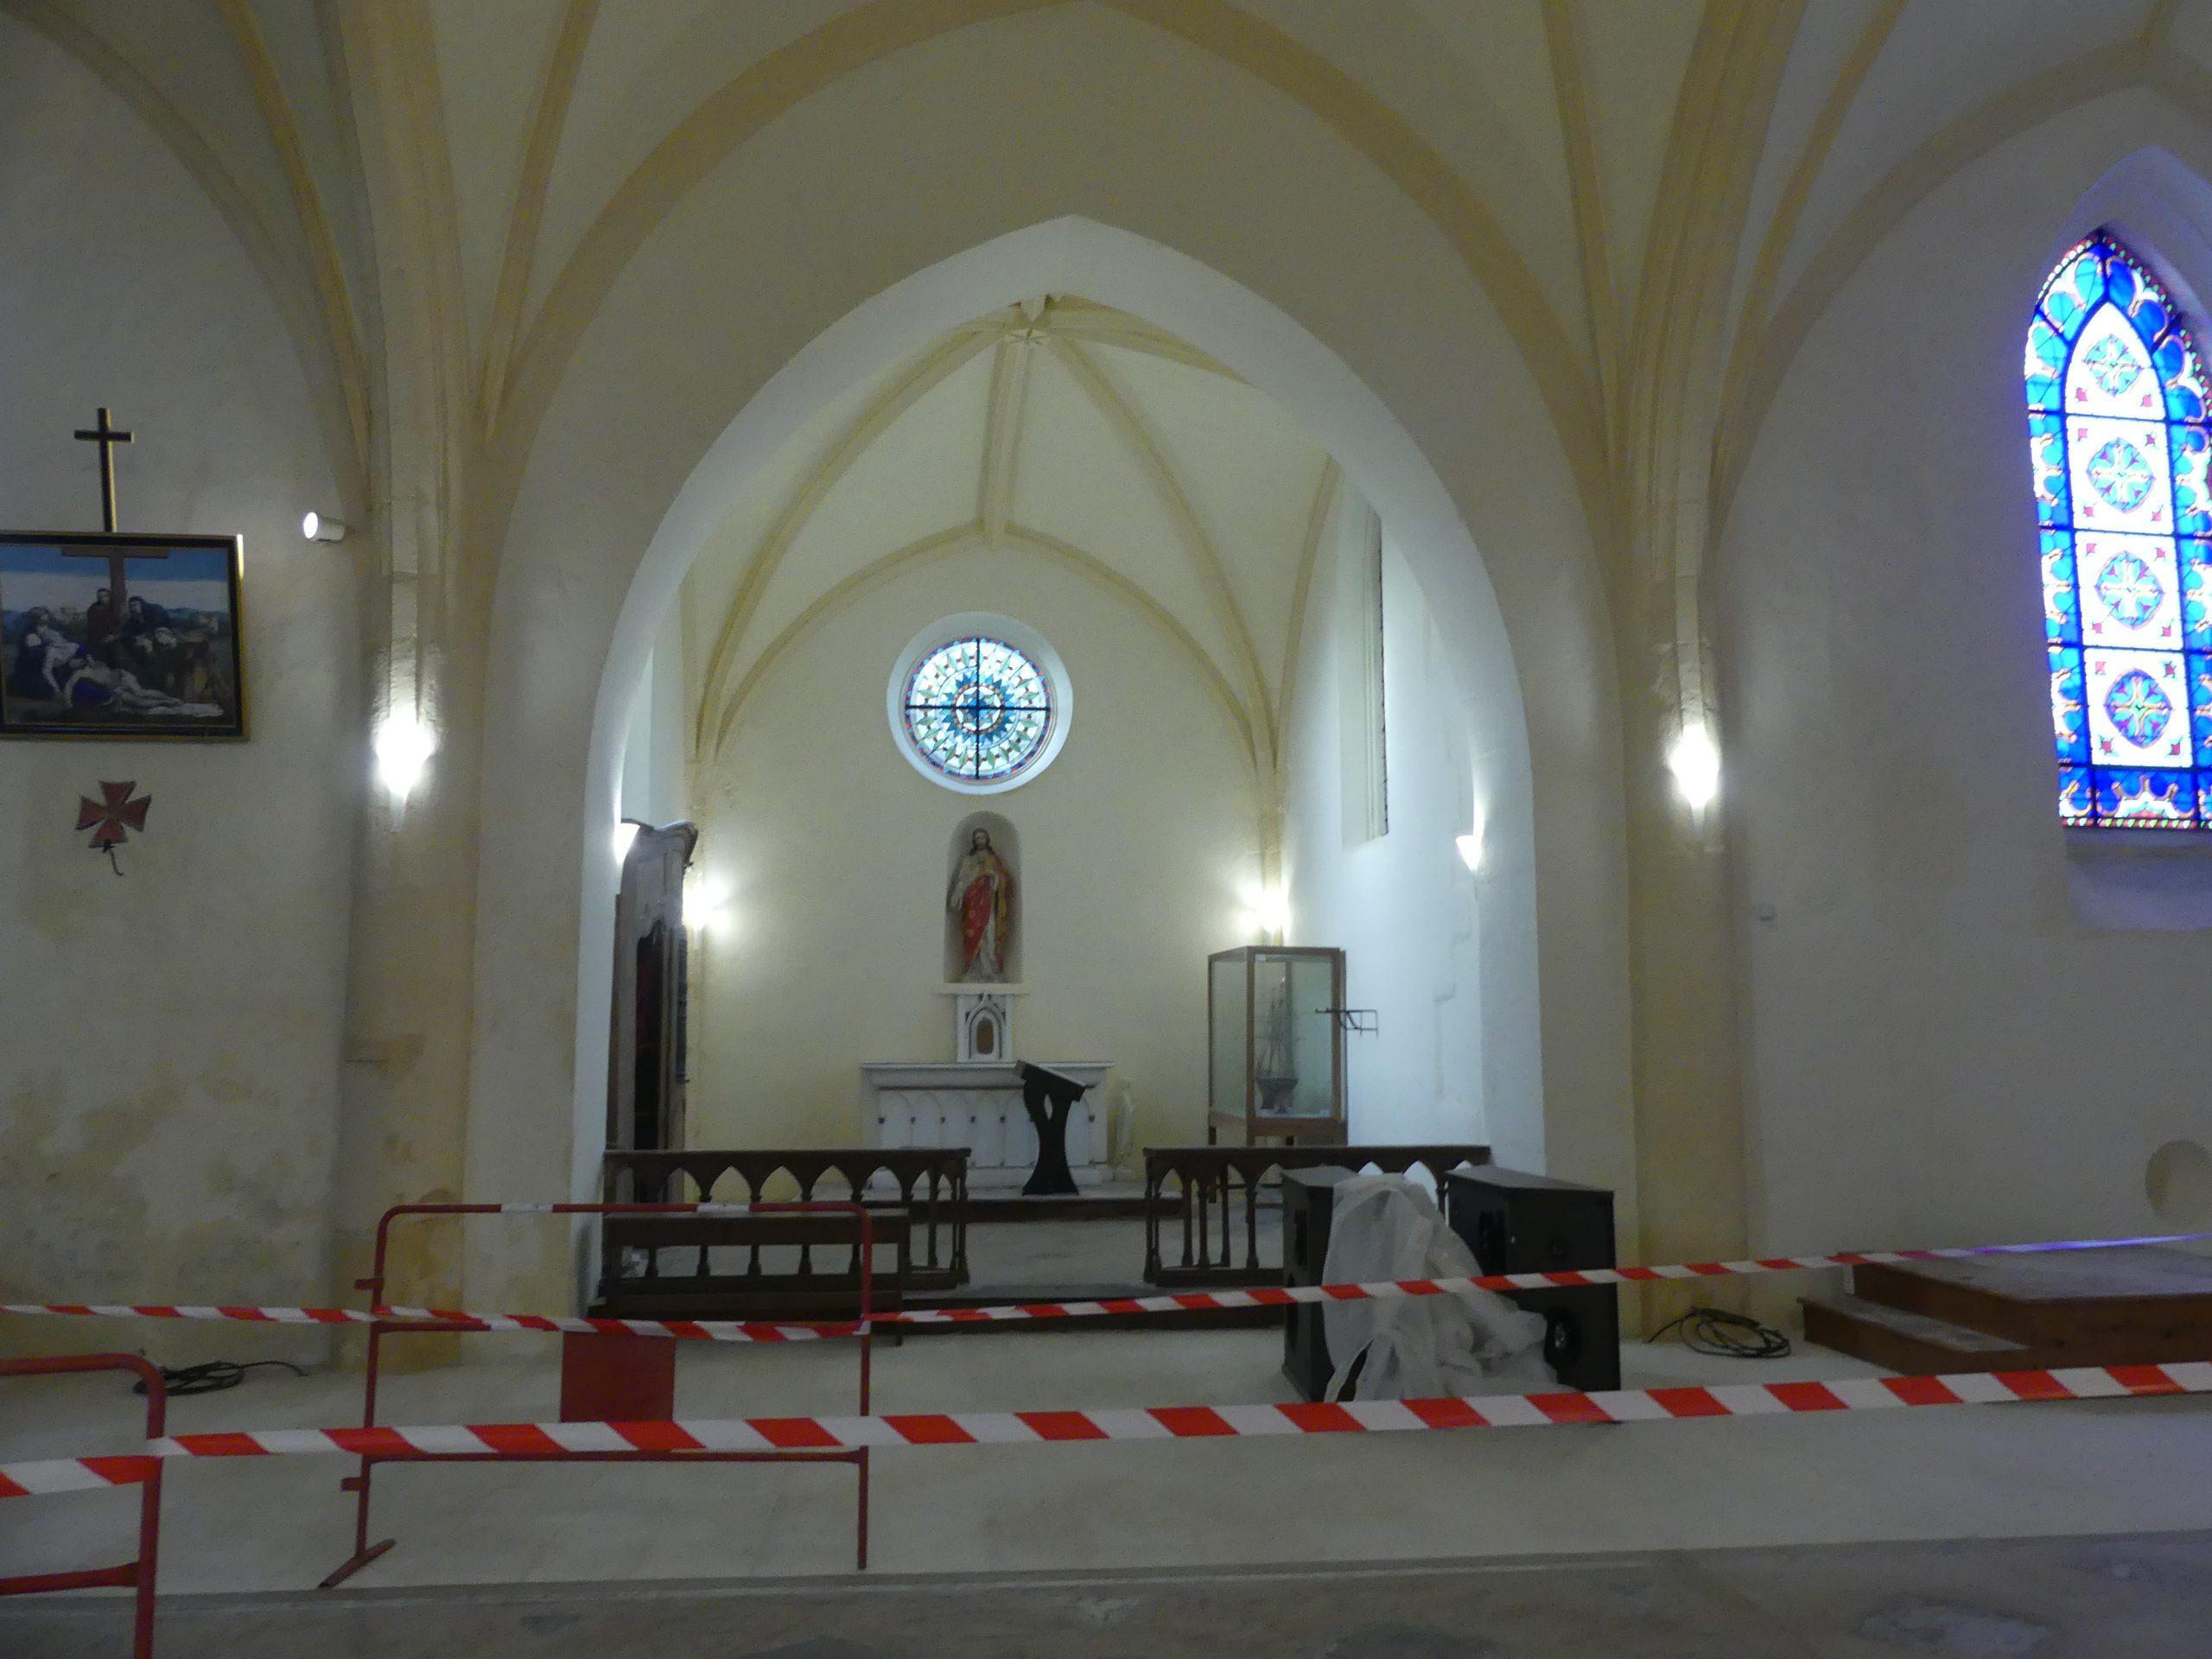 Ars - Eglise - Vitraux - 3 février 2020